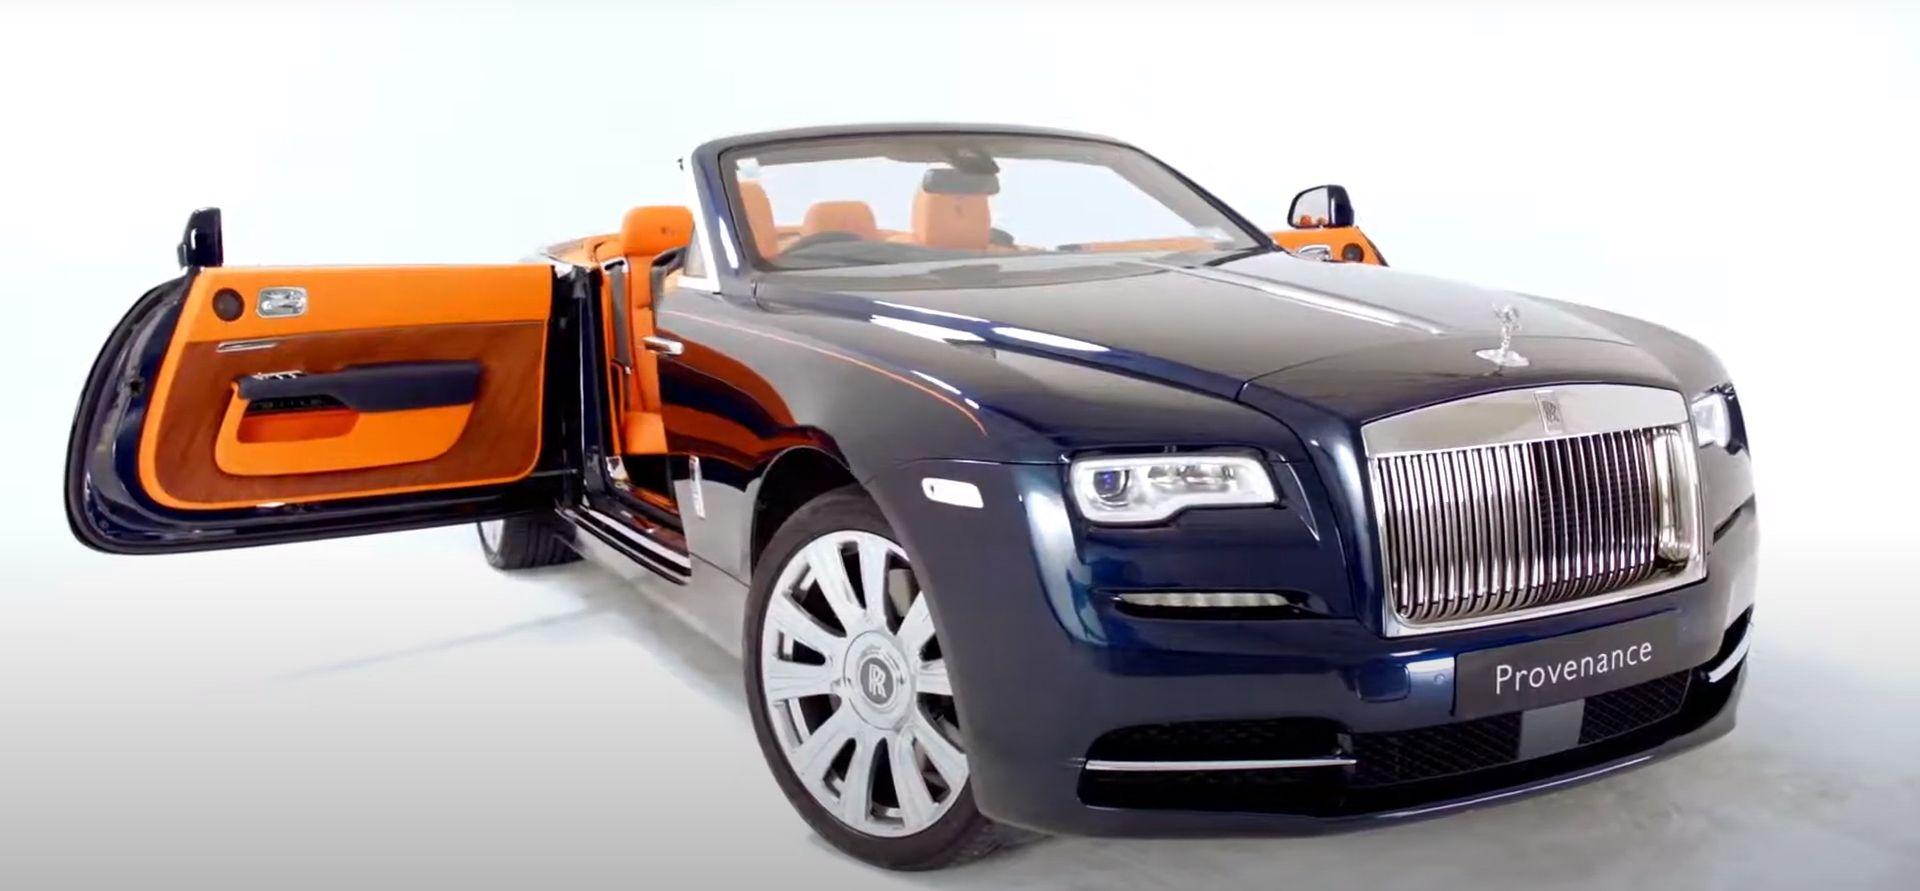 Rolls-royce-provenance